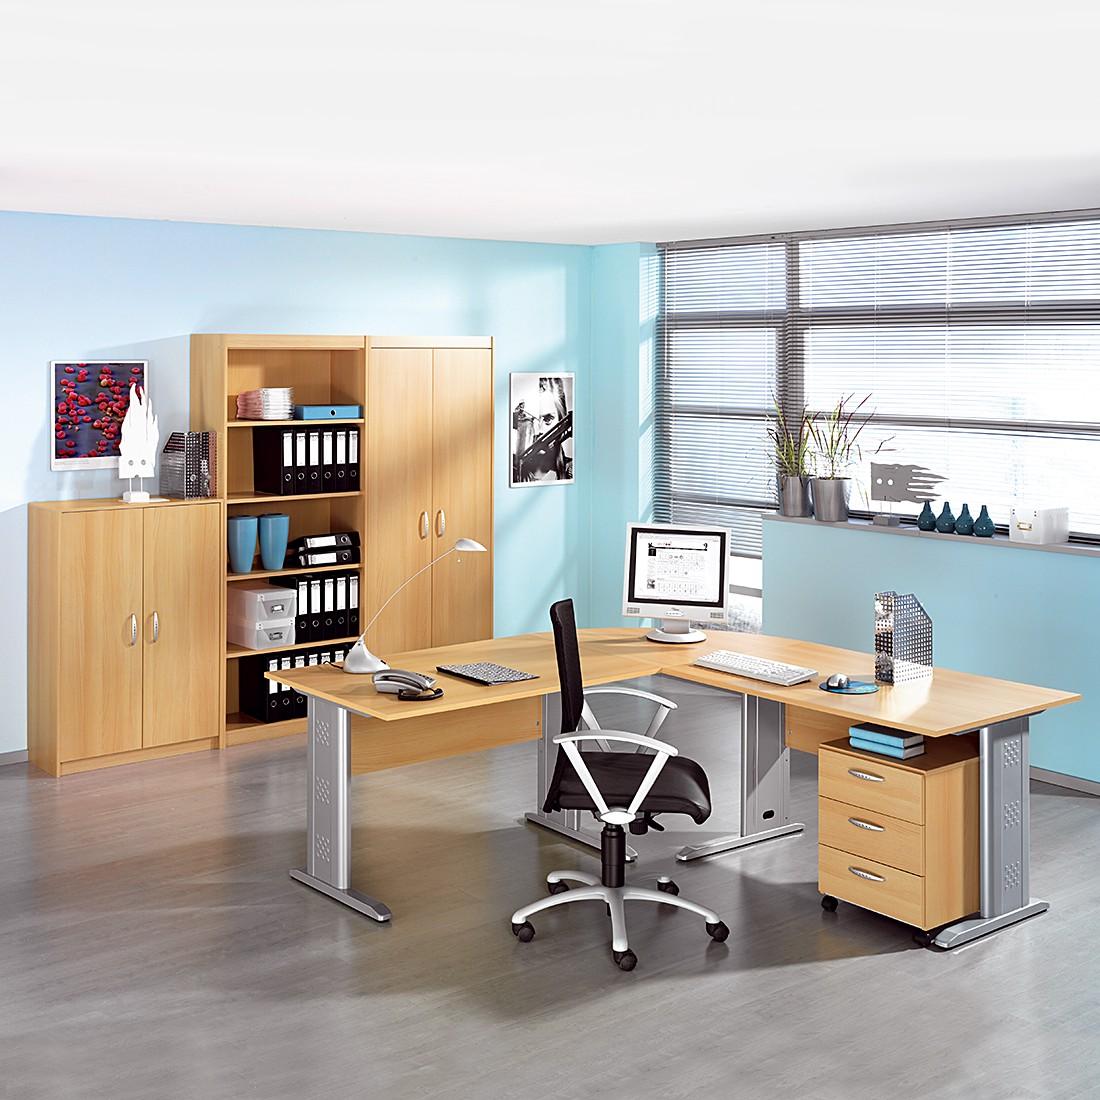 Mobilier de bureau Tomas 2